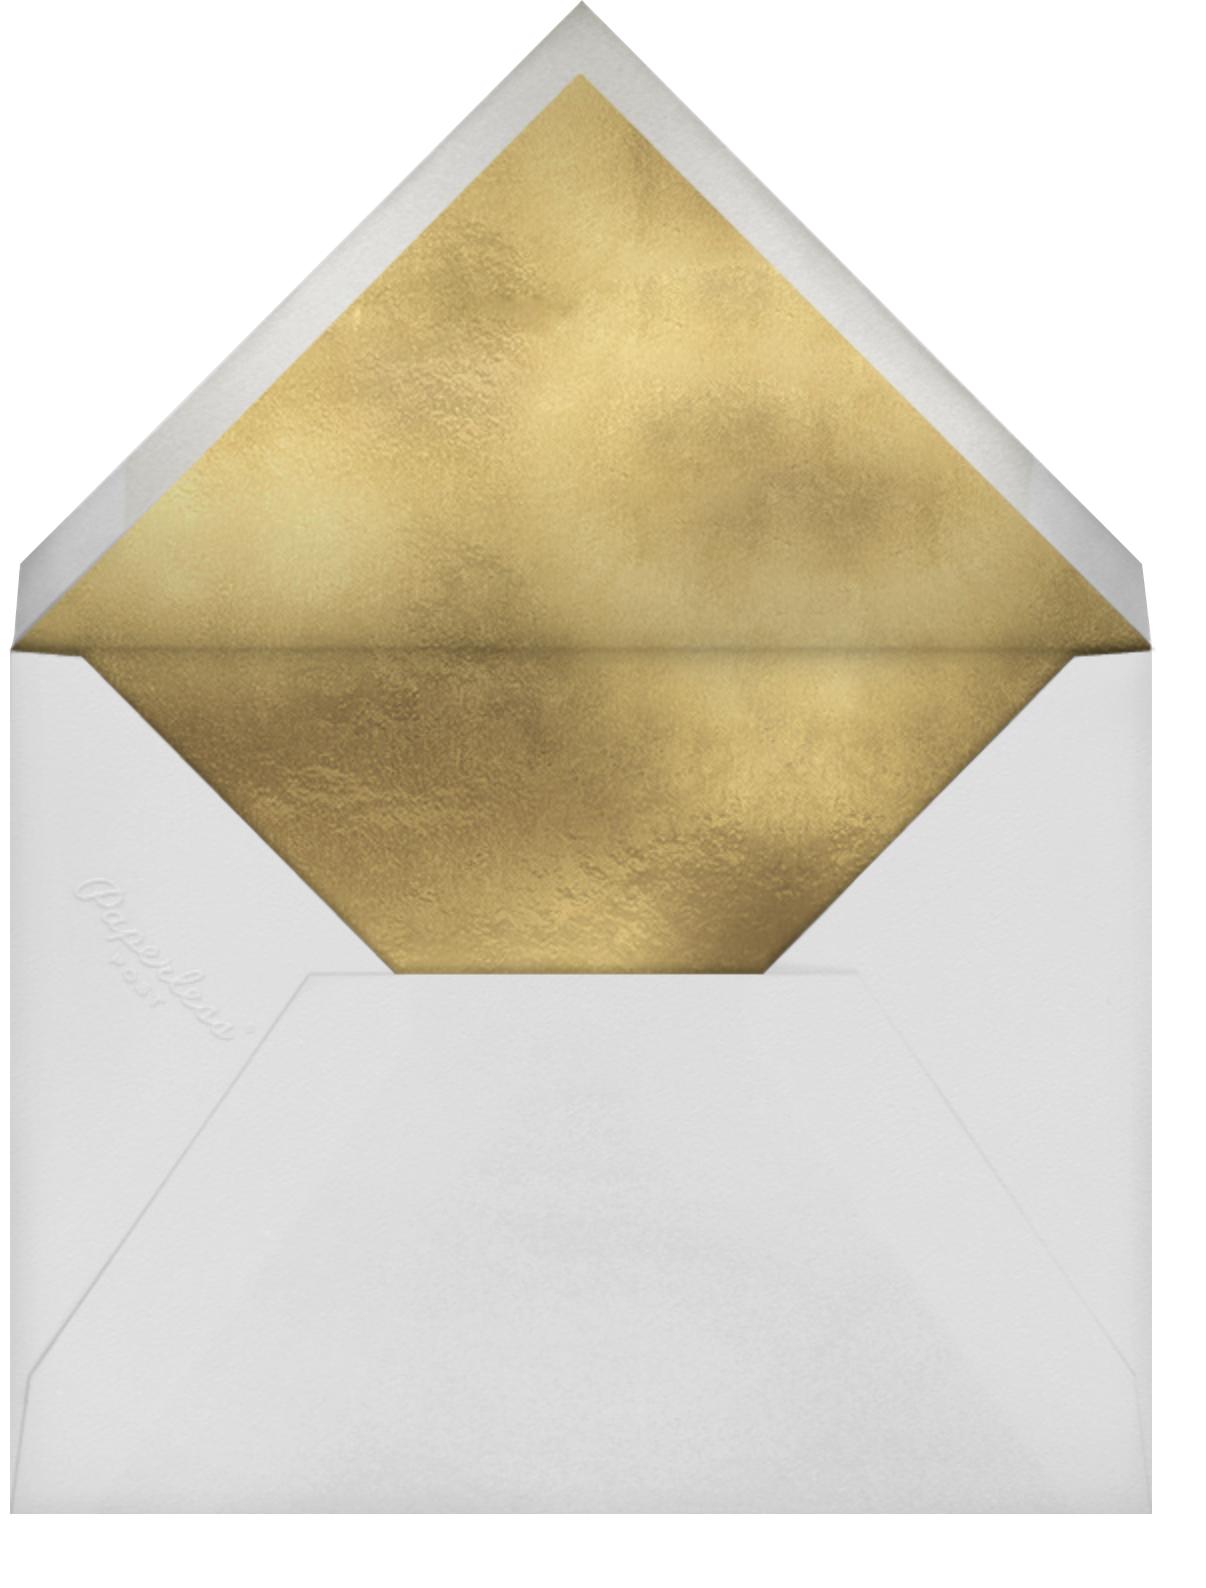 Triple Layer - kate spade new york - Envelope